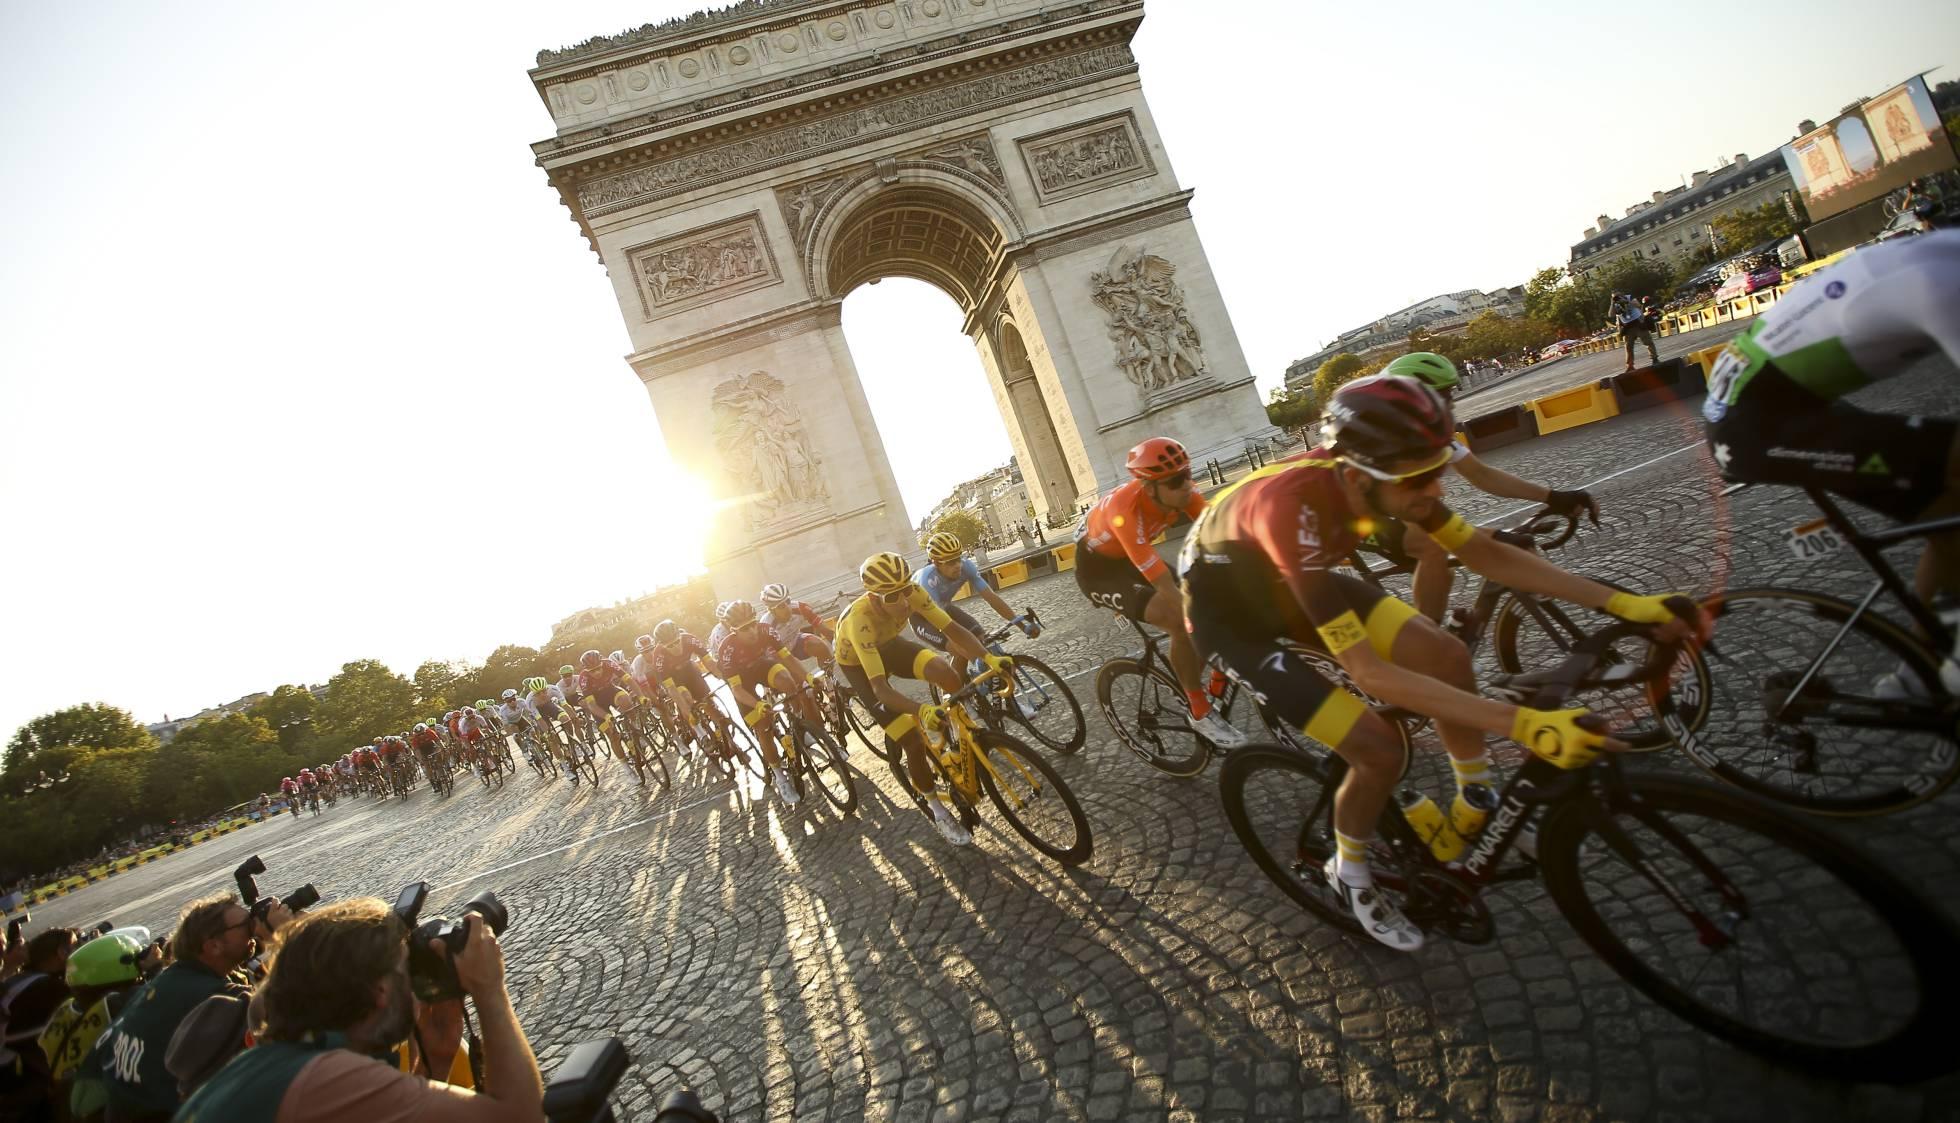 tour francia 2020 no se suspende coronavirus